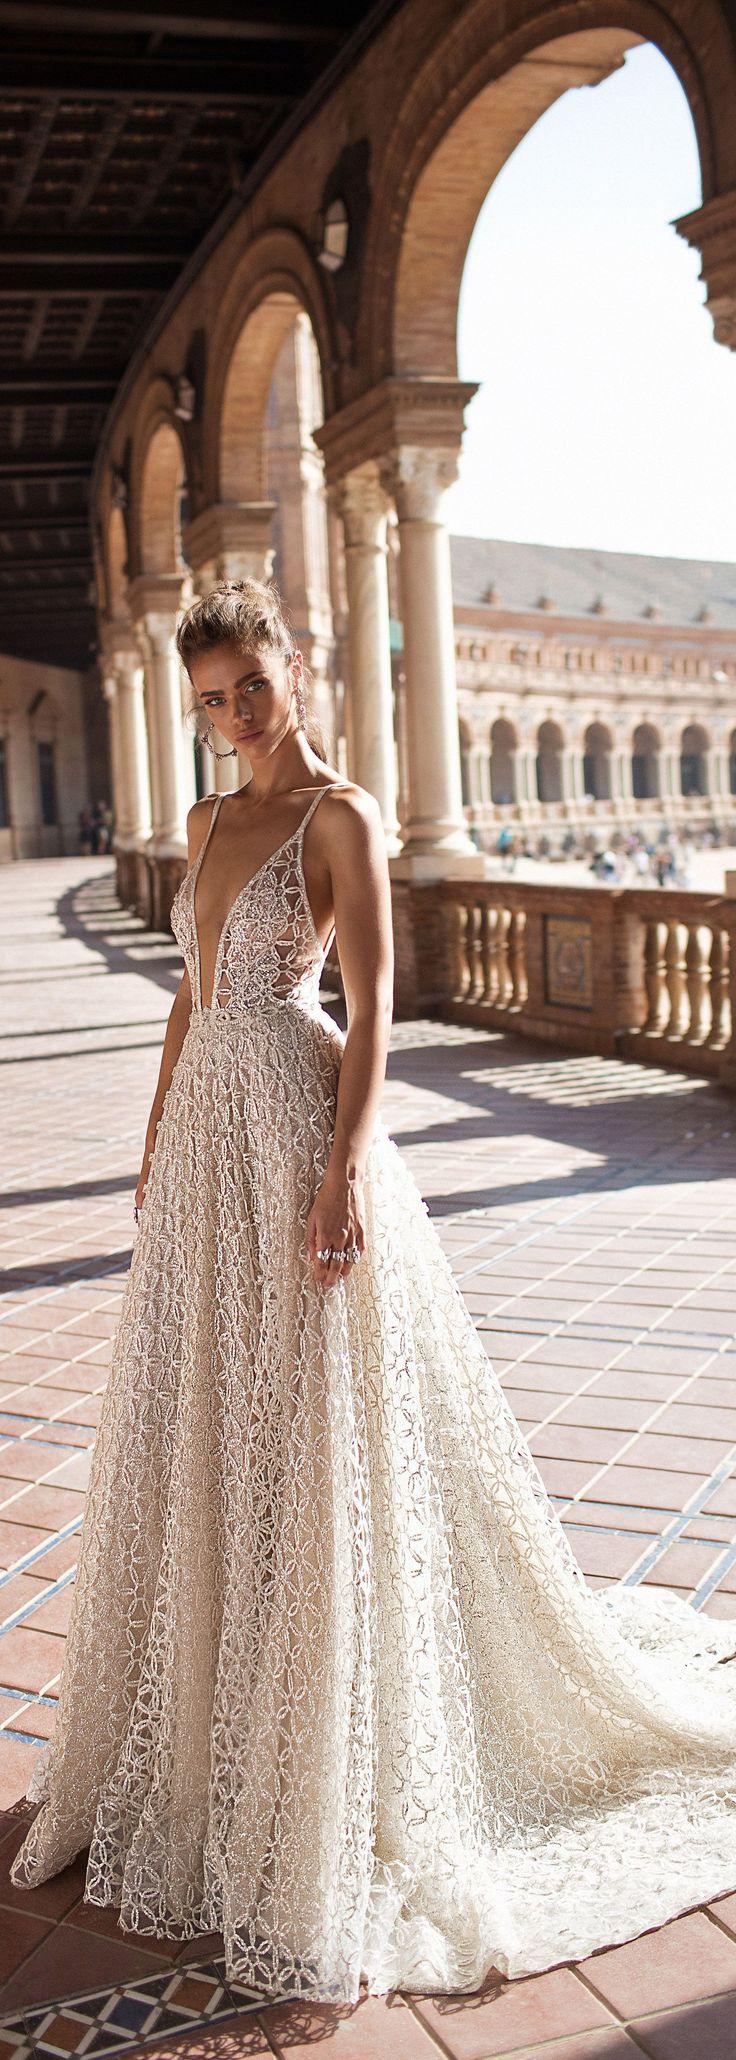 A beautiful v-neck wedding dress by @bertabridal from their BERTA Seville collection #bertabridal #berta #weddinggowns